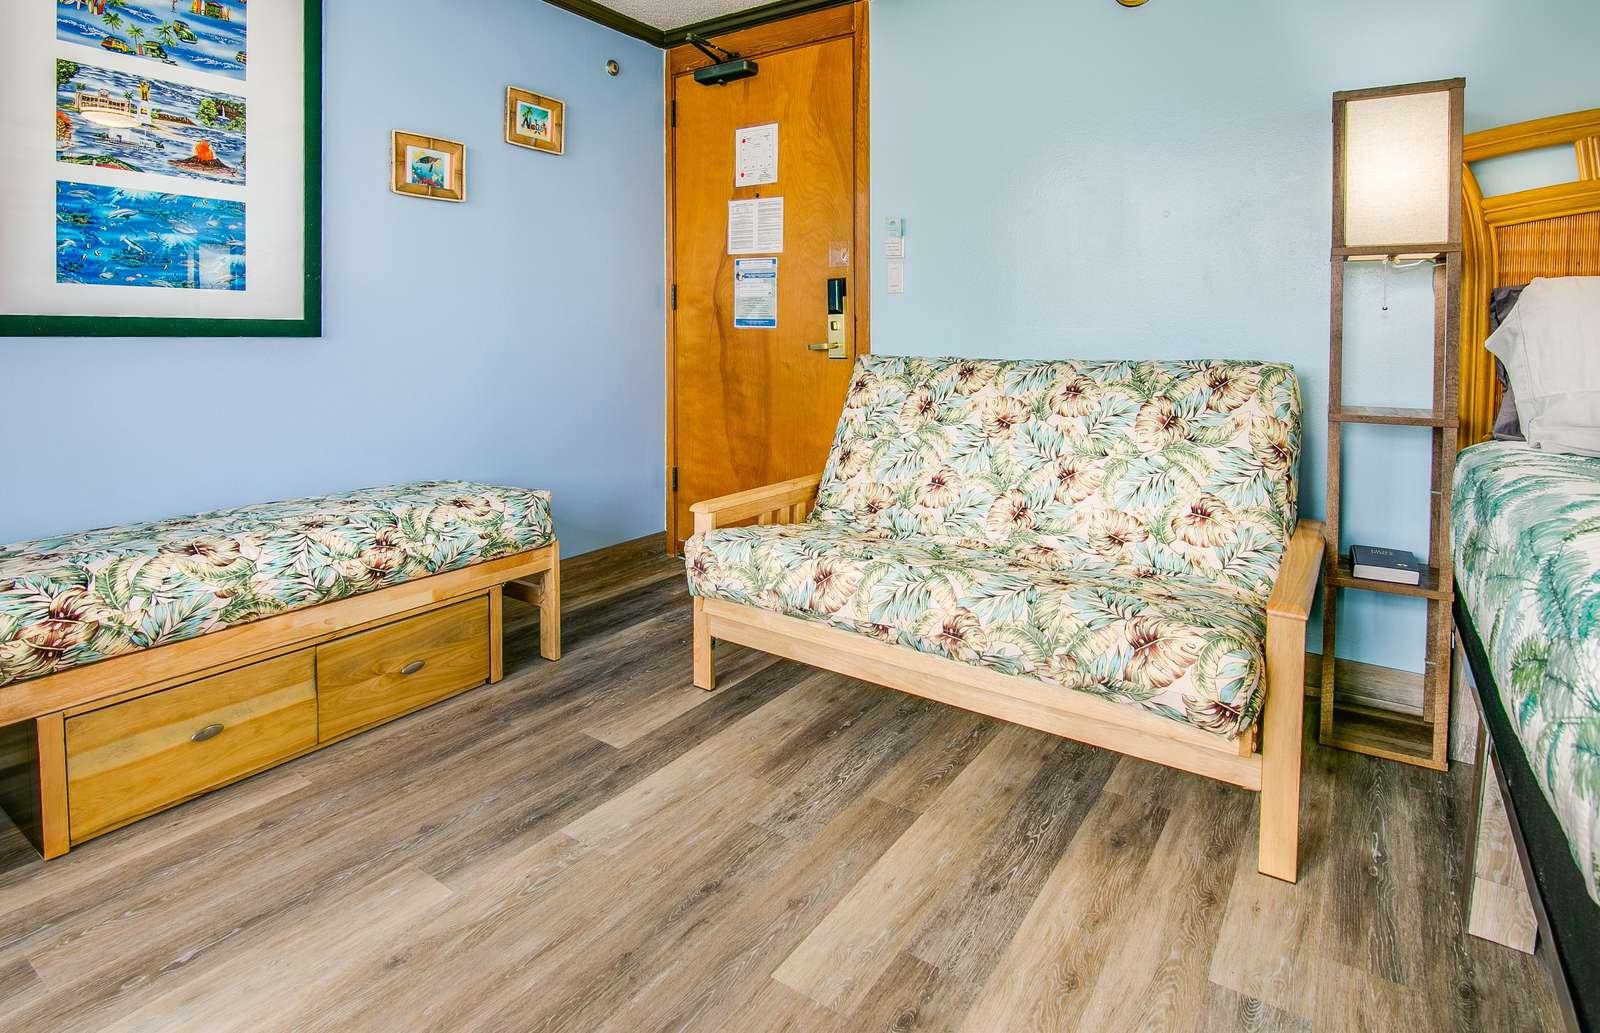 foldout sleeper futon